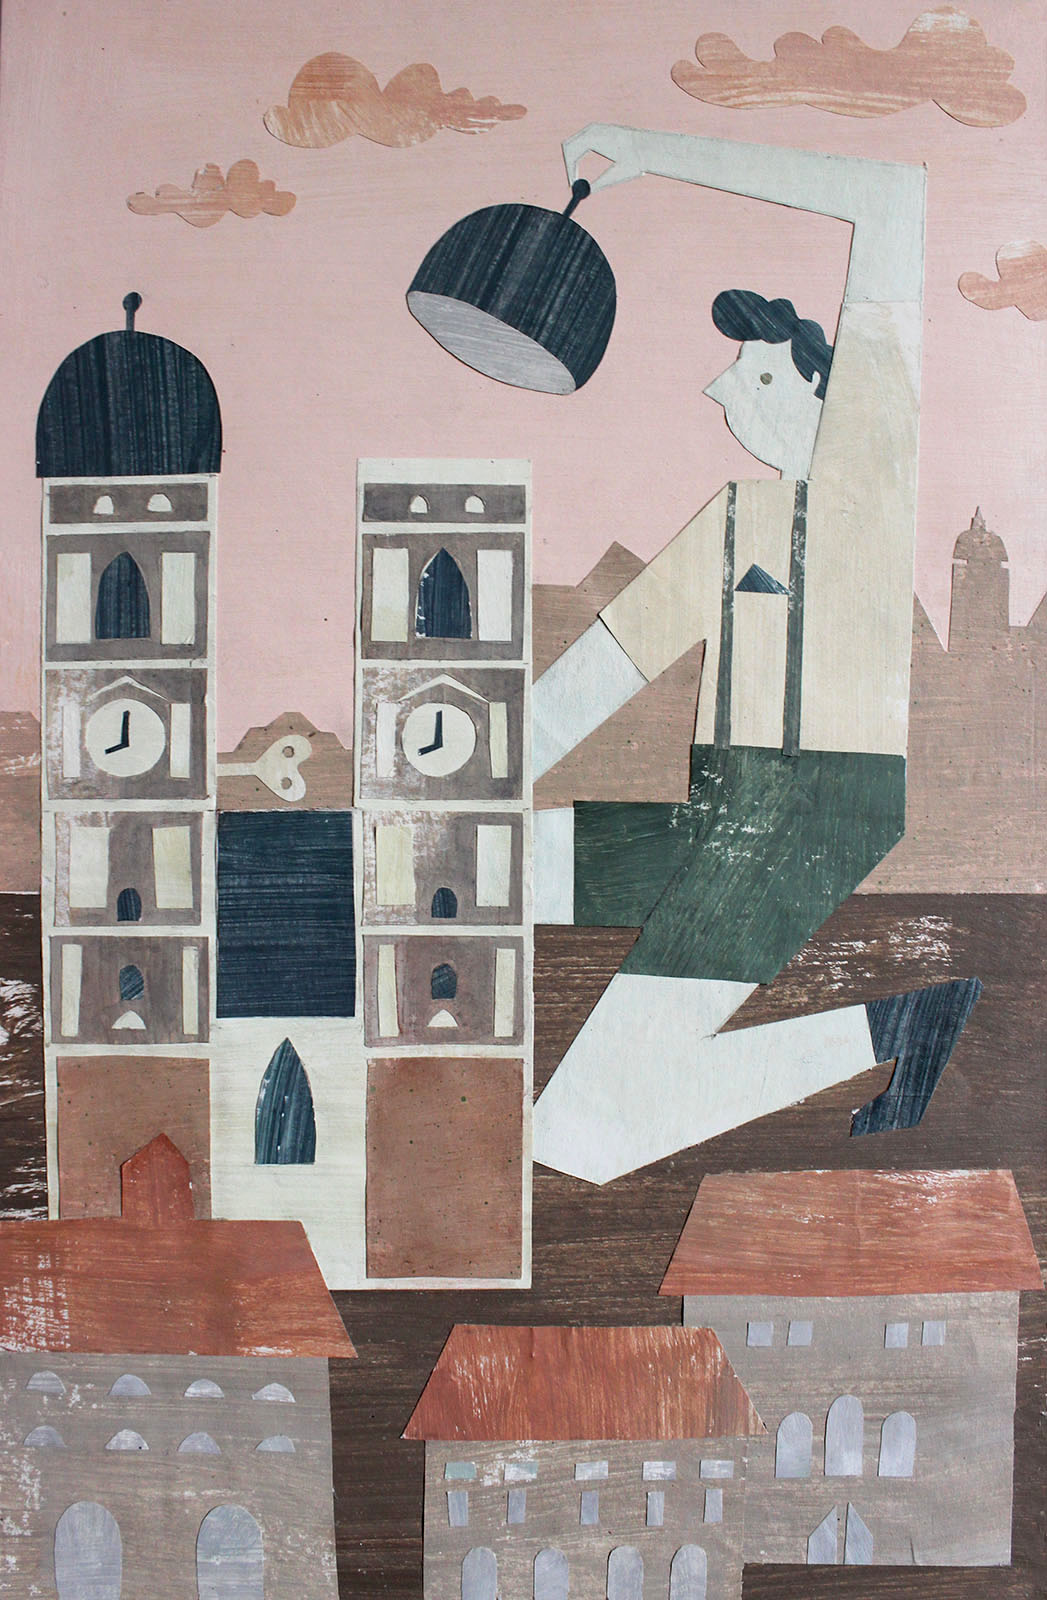 Illustration by Sandra Kim